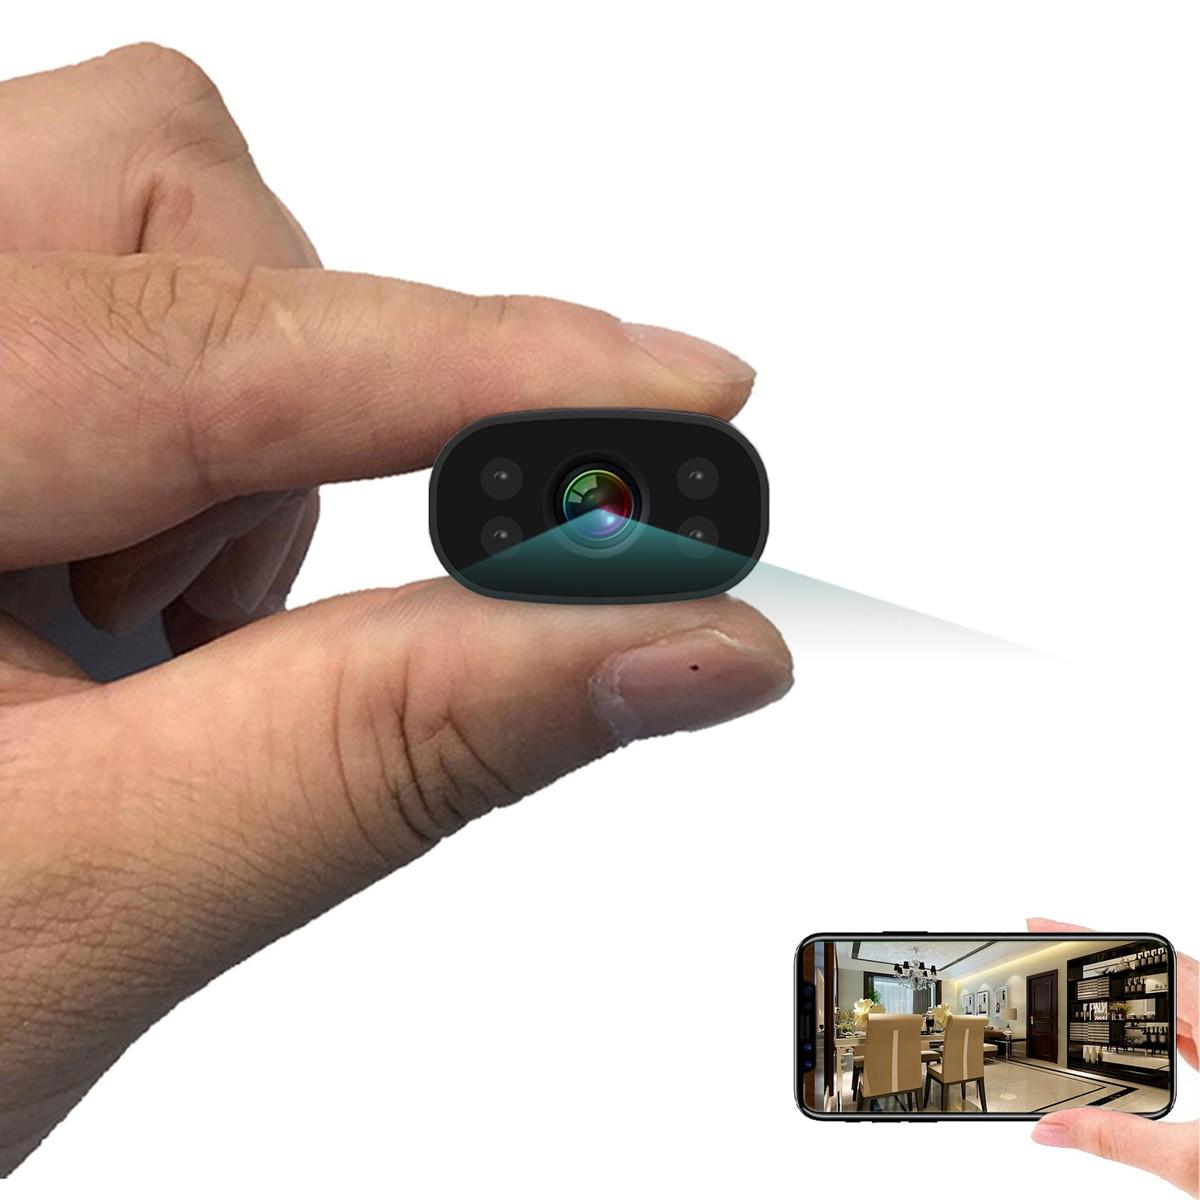 PNZEO-كاميرا أمان صغيرة لاسلكية صغيرة بدقة 1080 بكسل عالية الدقة ، وكاميرا فيديو مصغرة ، ومراقبة ممرضة ، وعرض عن بعد